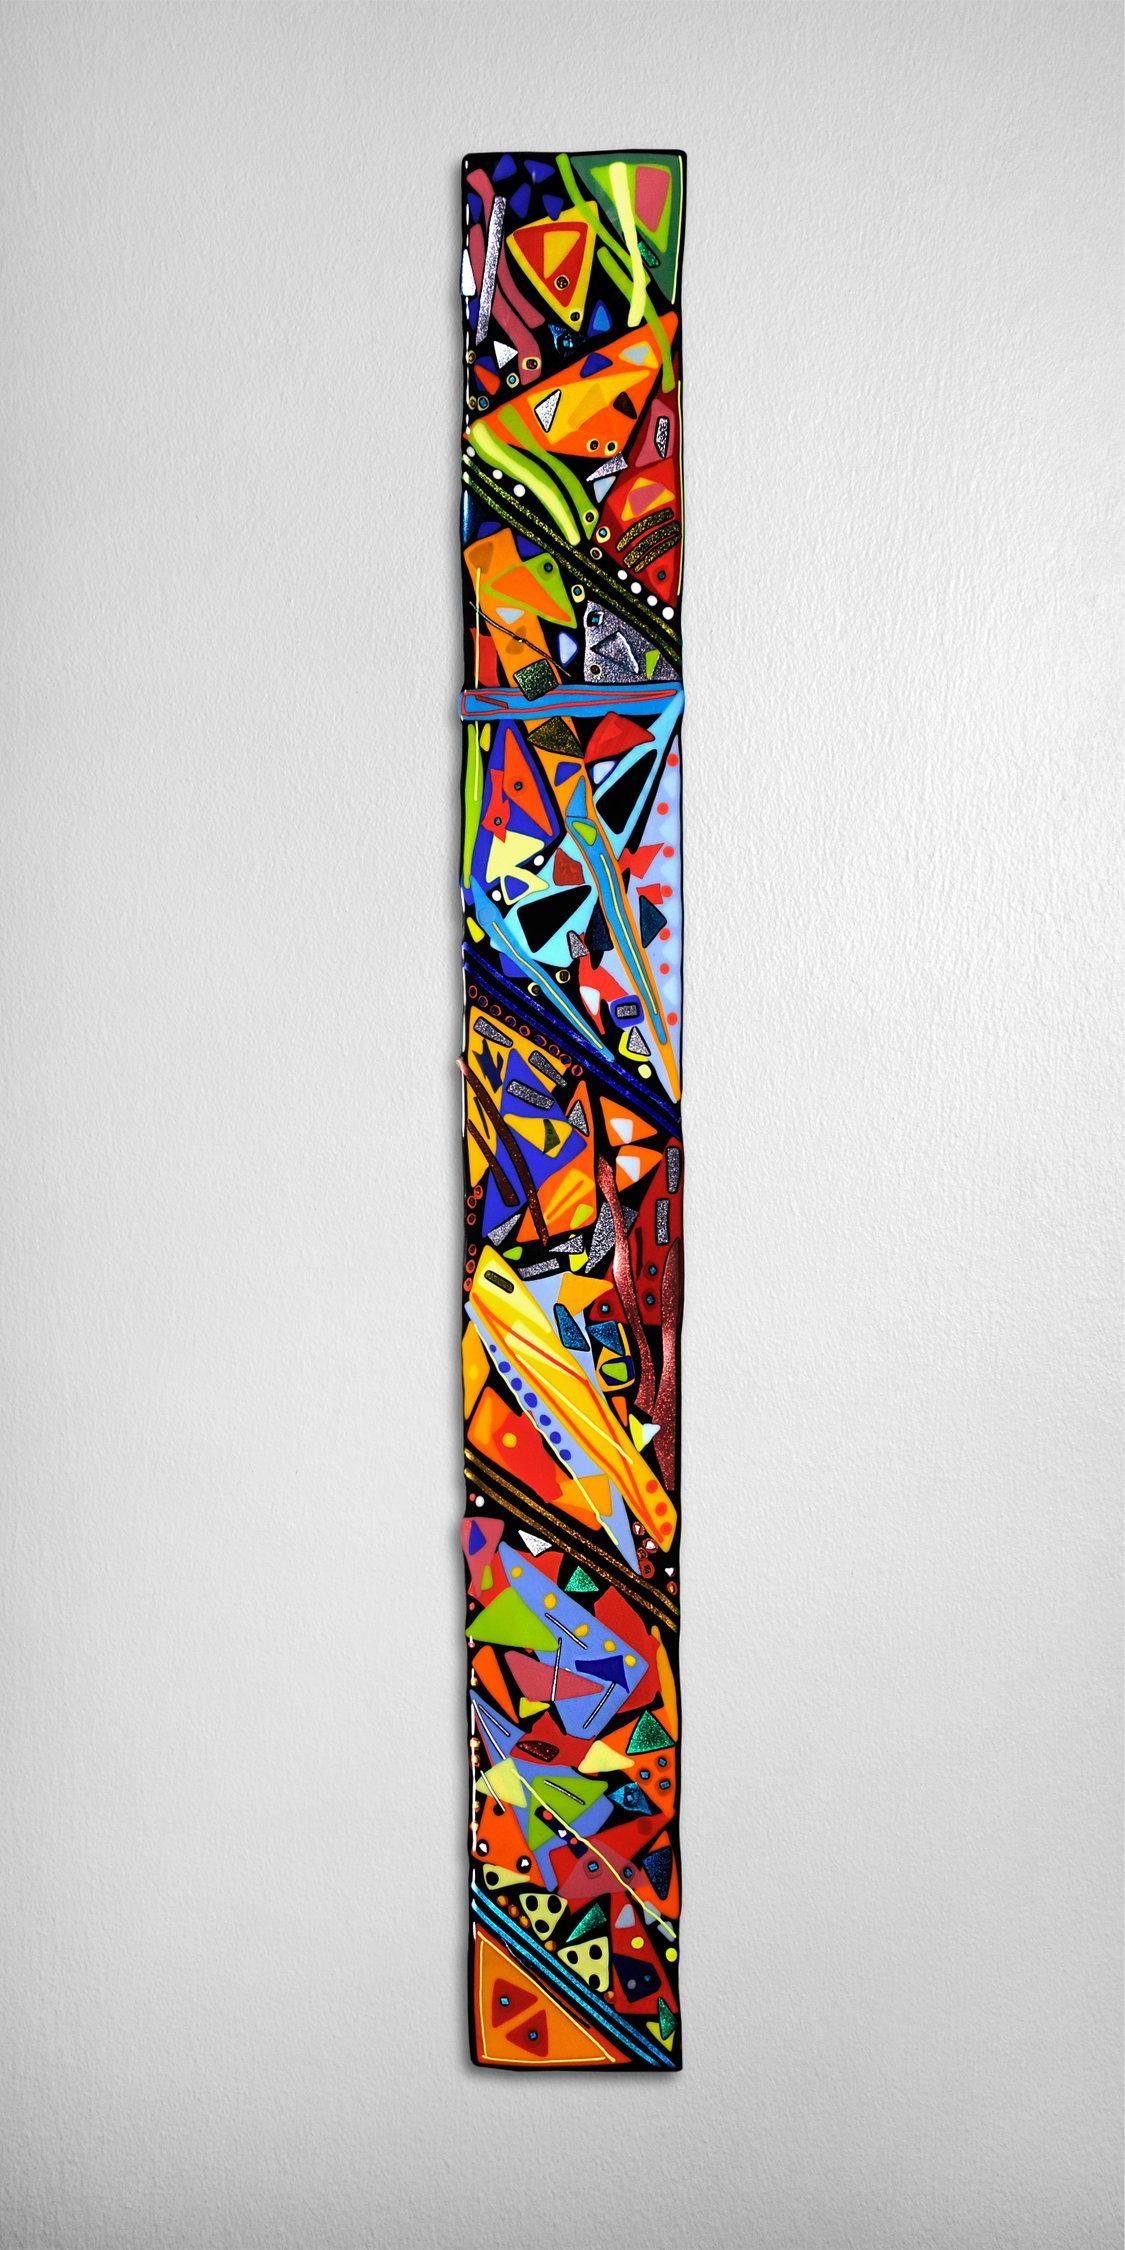 Artisanal Chocolates | Artful Home Regarding Glass Wall Artworks (Image 11 of 20)